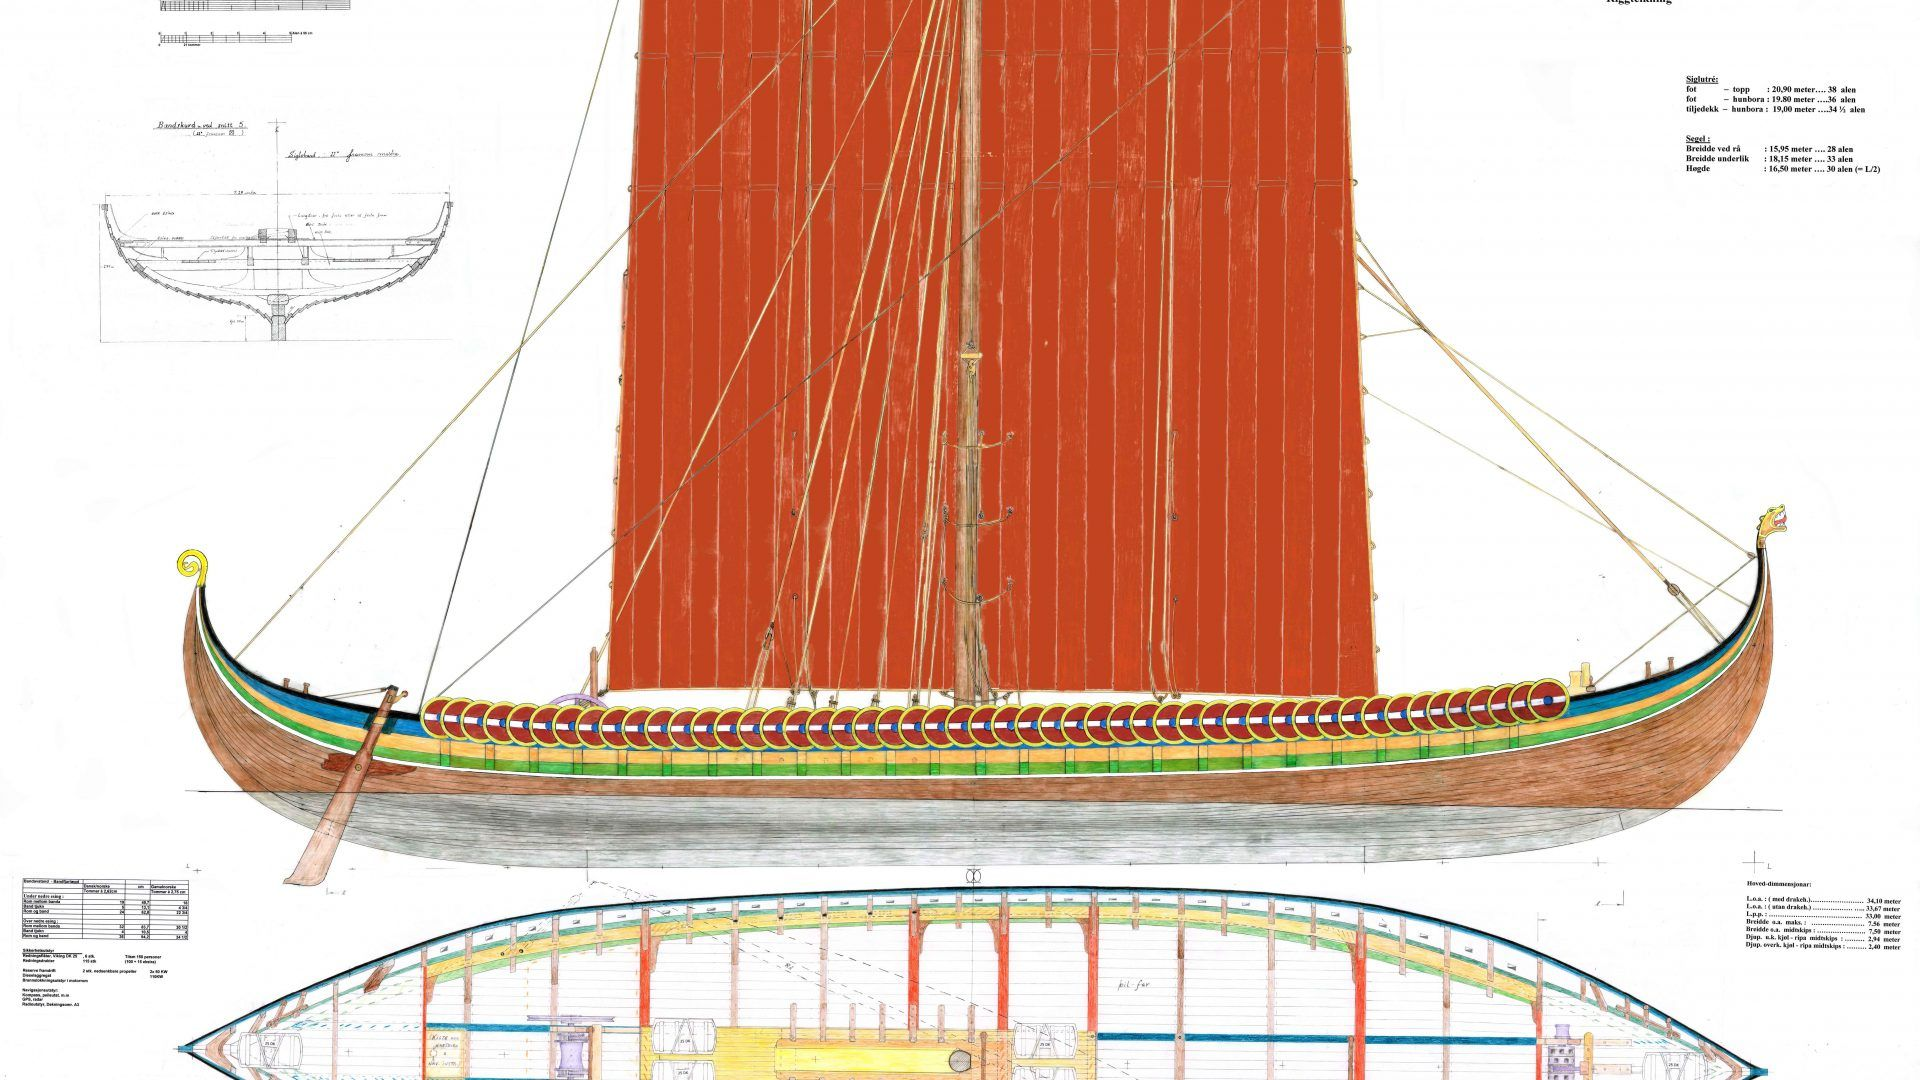 VIKING SHIP I T-SHIRT Vikings Schiff Wikinger Langboot Drachenboot Langschiff